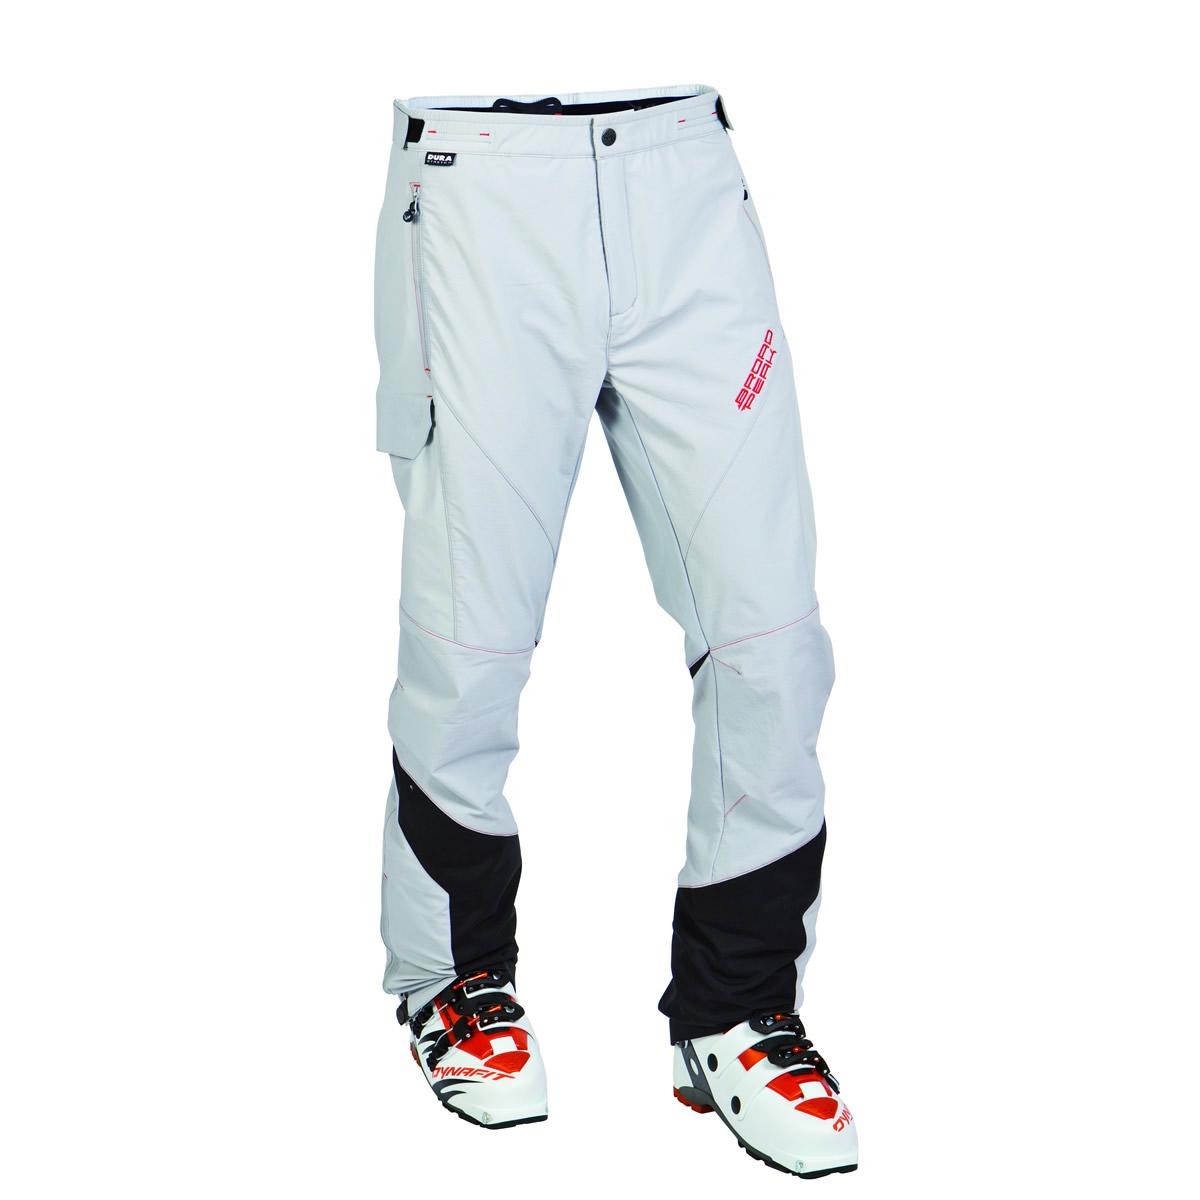 Pantalon Broad Peak DST Pant de Dynafit